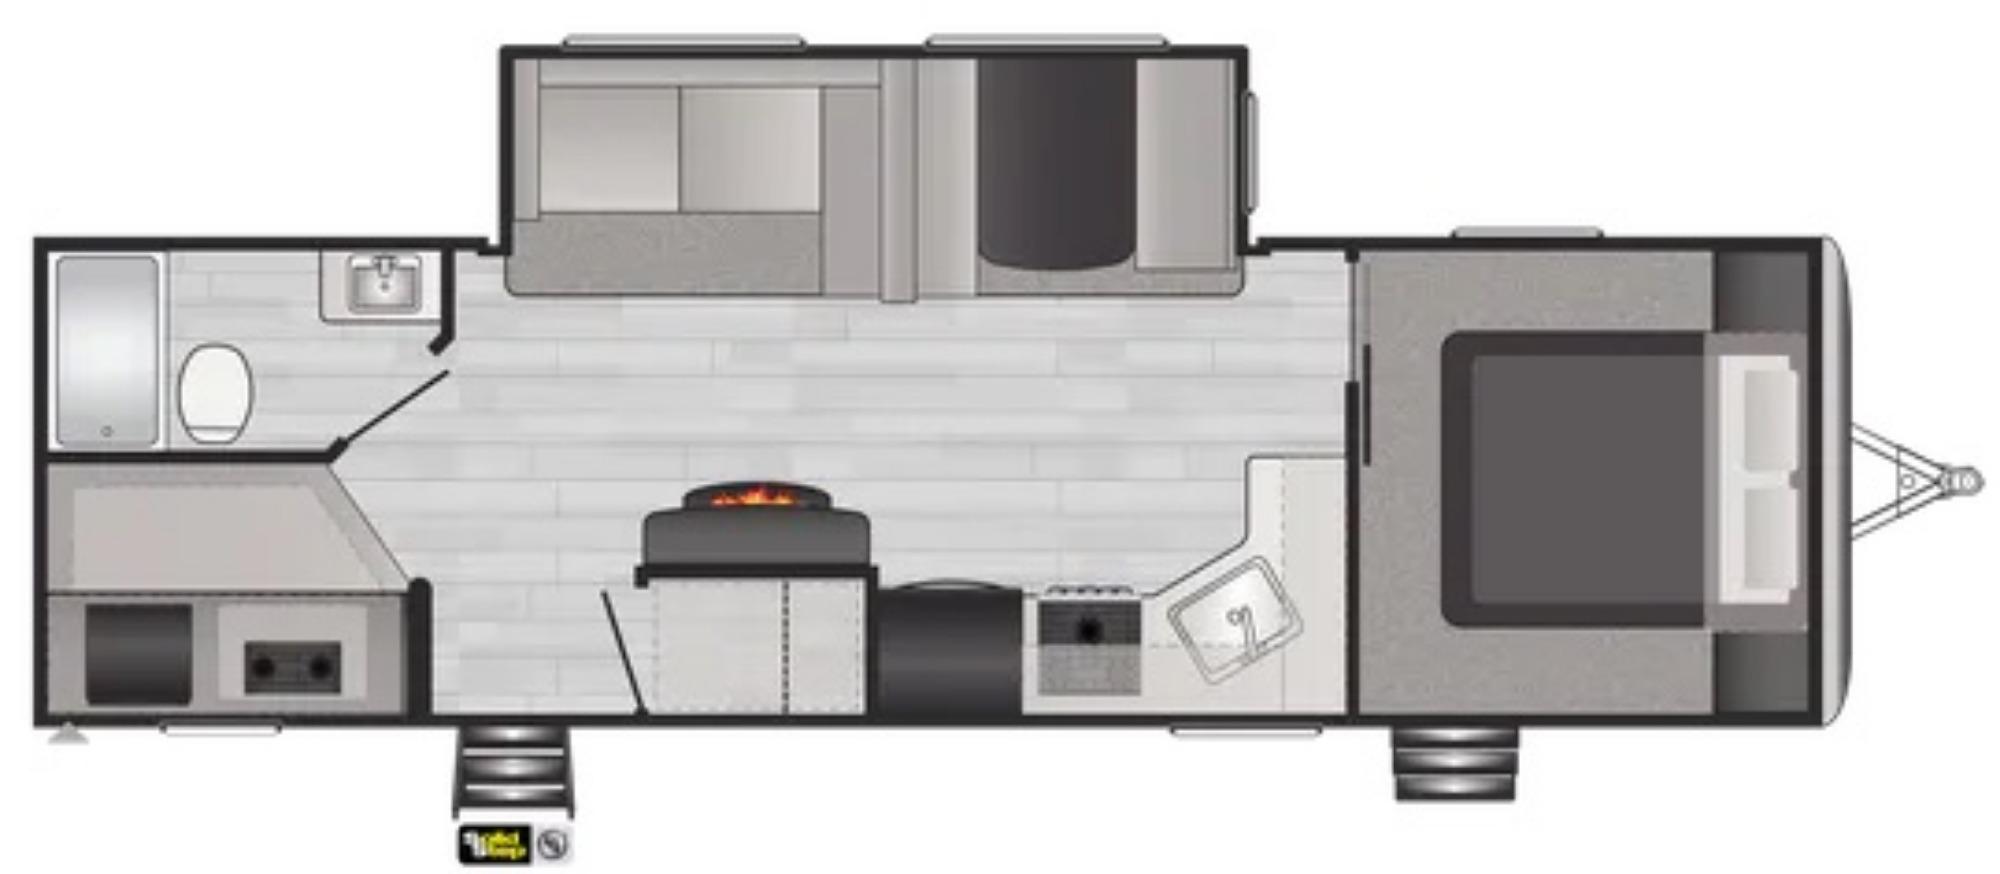 View Floor Plan for 2022 KEYSTONE SPRINGDALE 280BH